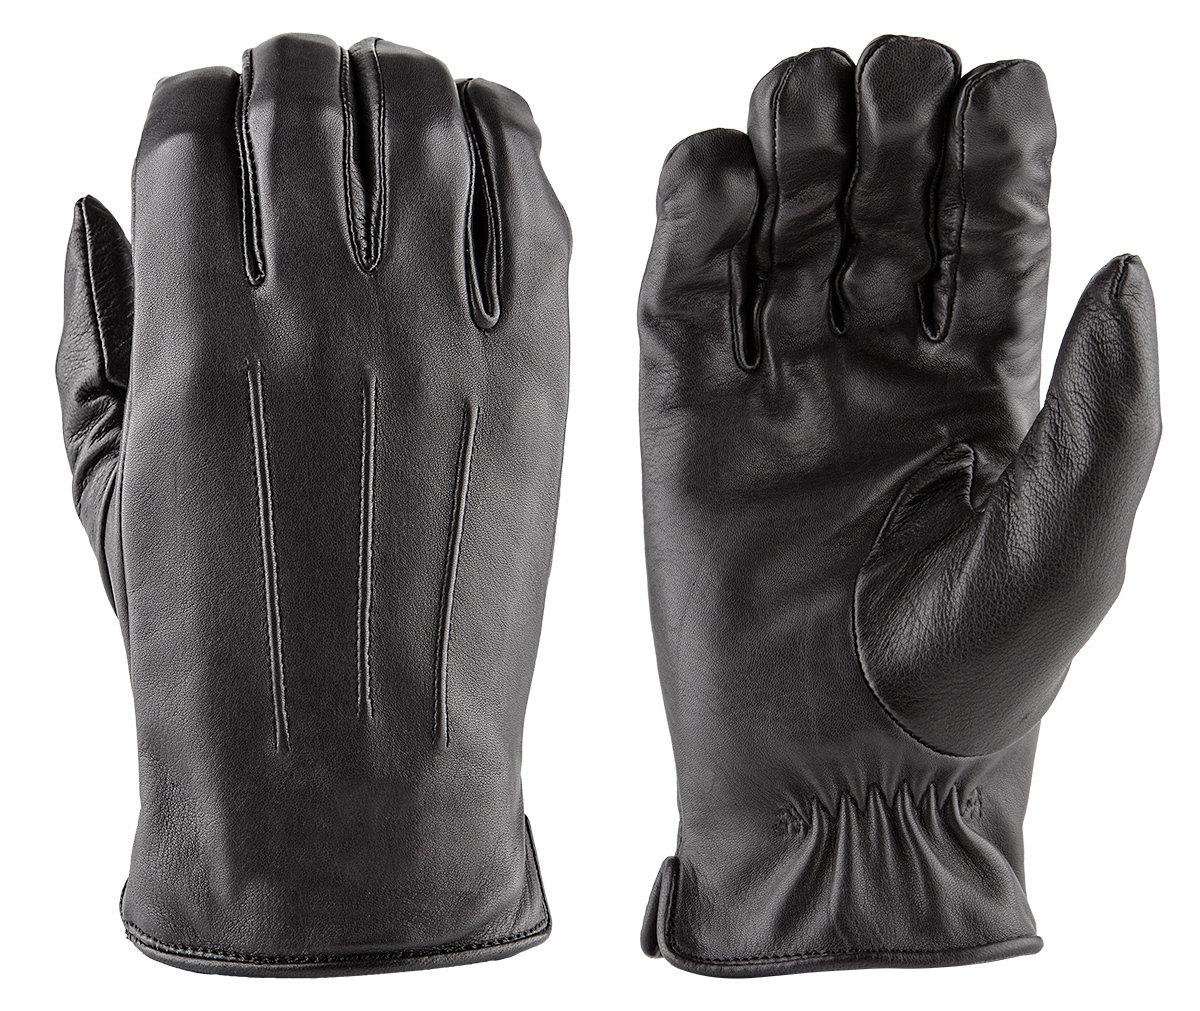 LUXE Deer Skin Leather Gloves w/ Faux Fur Lining